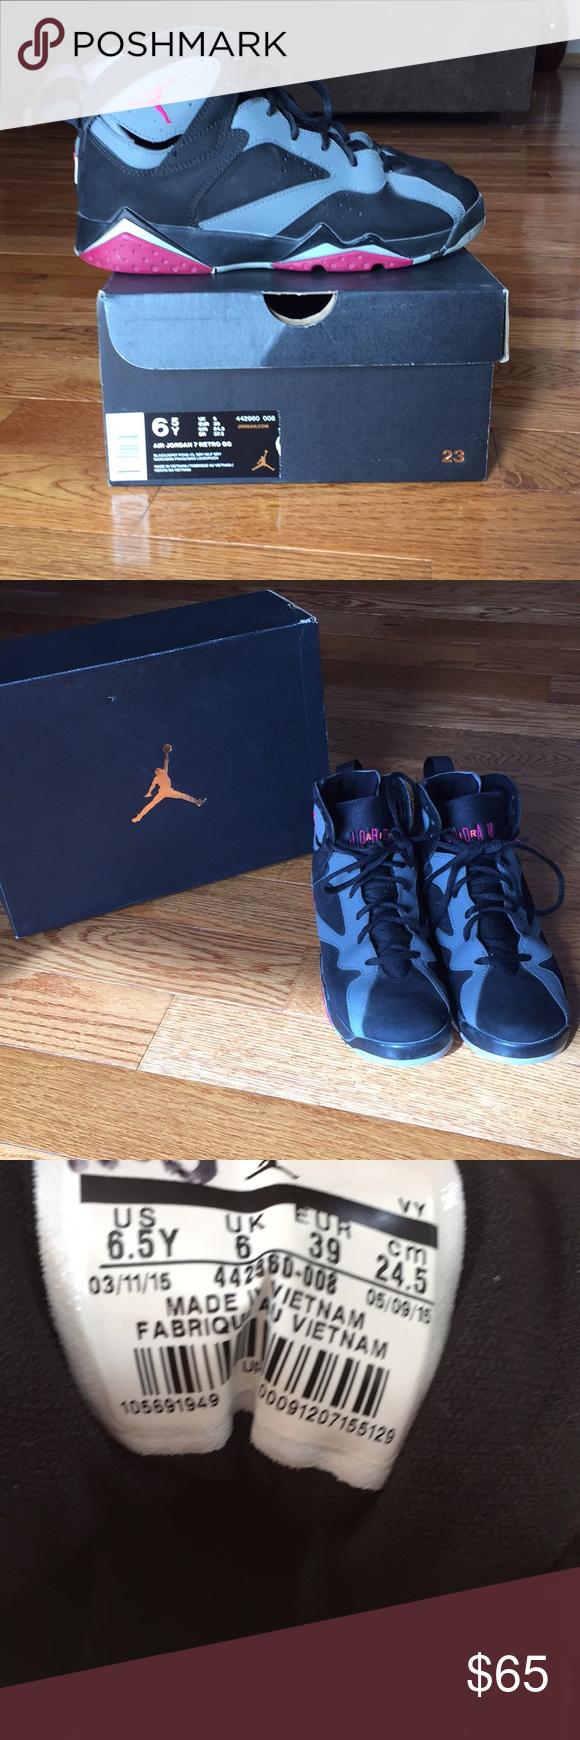 a7a90384d389 Air Jordan 7 Retro GG Air Jordan 7 Retro GG - wore a few times in great  condition. Size 6.5Y is an 8 in women s Air Jordan Shoes Sneakers